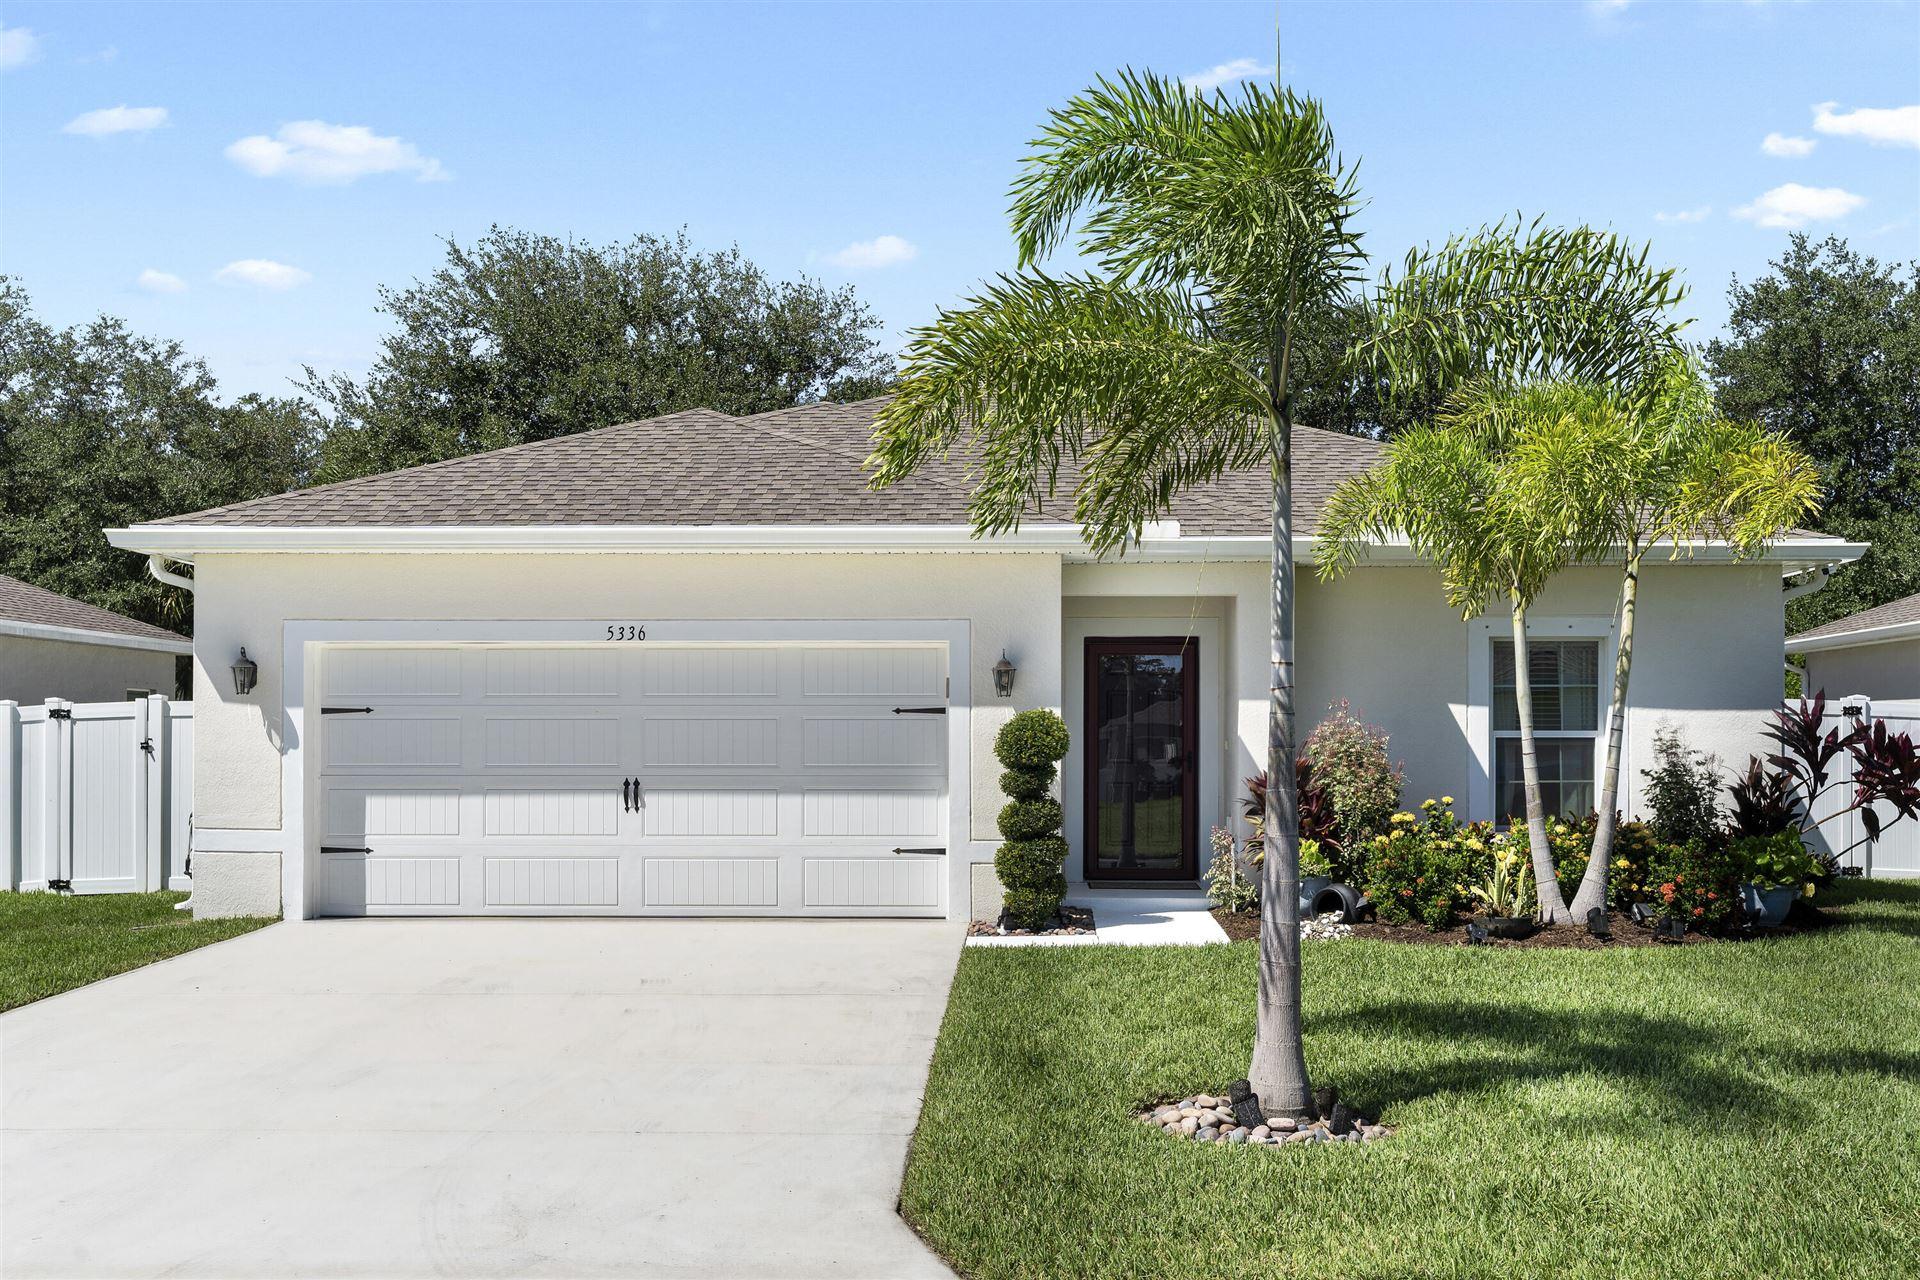 5336 Oakland Lake Circle, Fort Pierce, FL 34951 - MLS#: RX-10749099